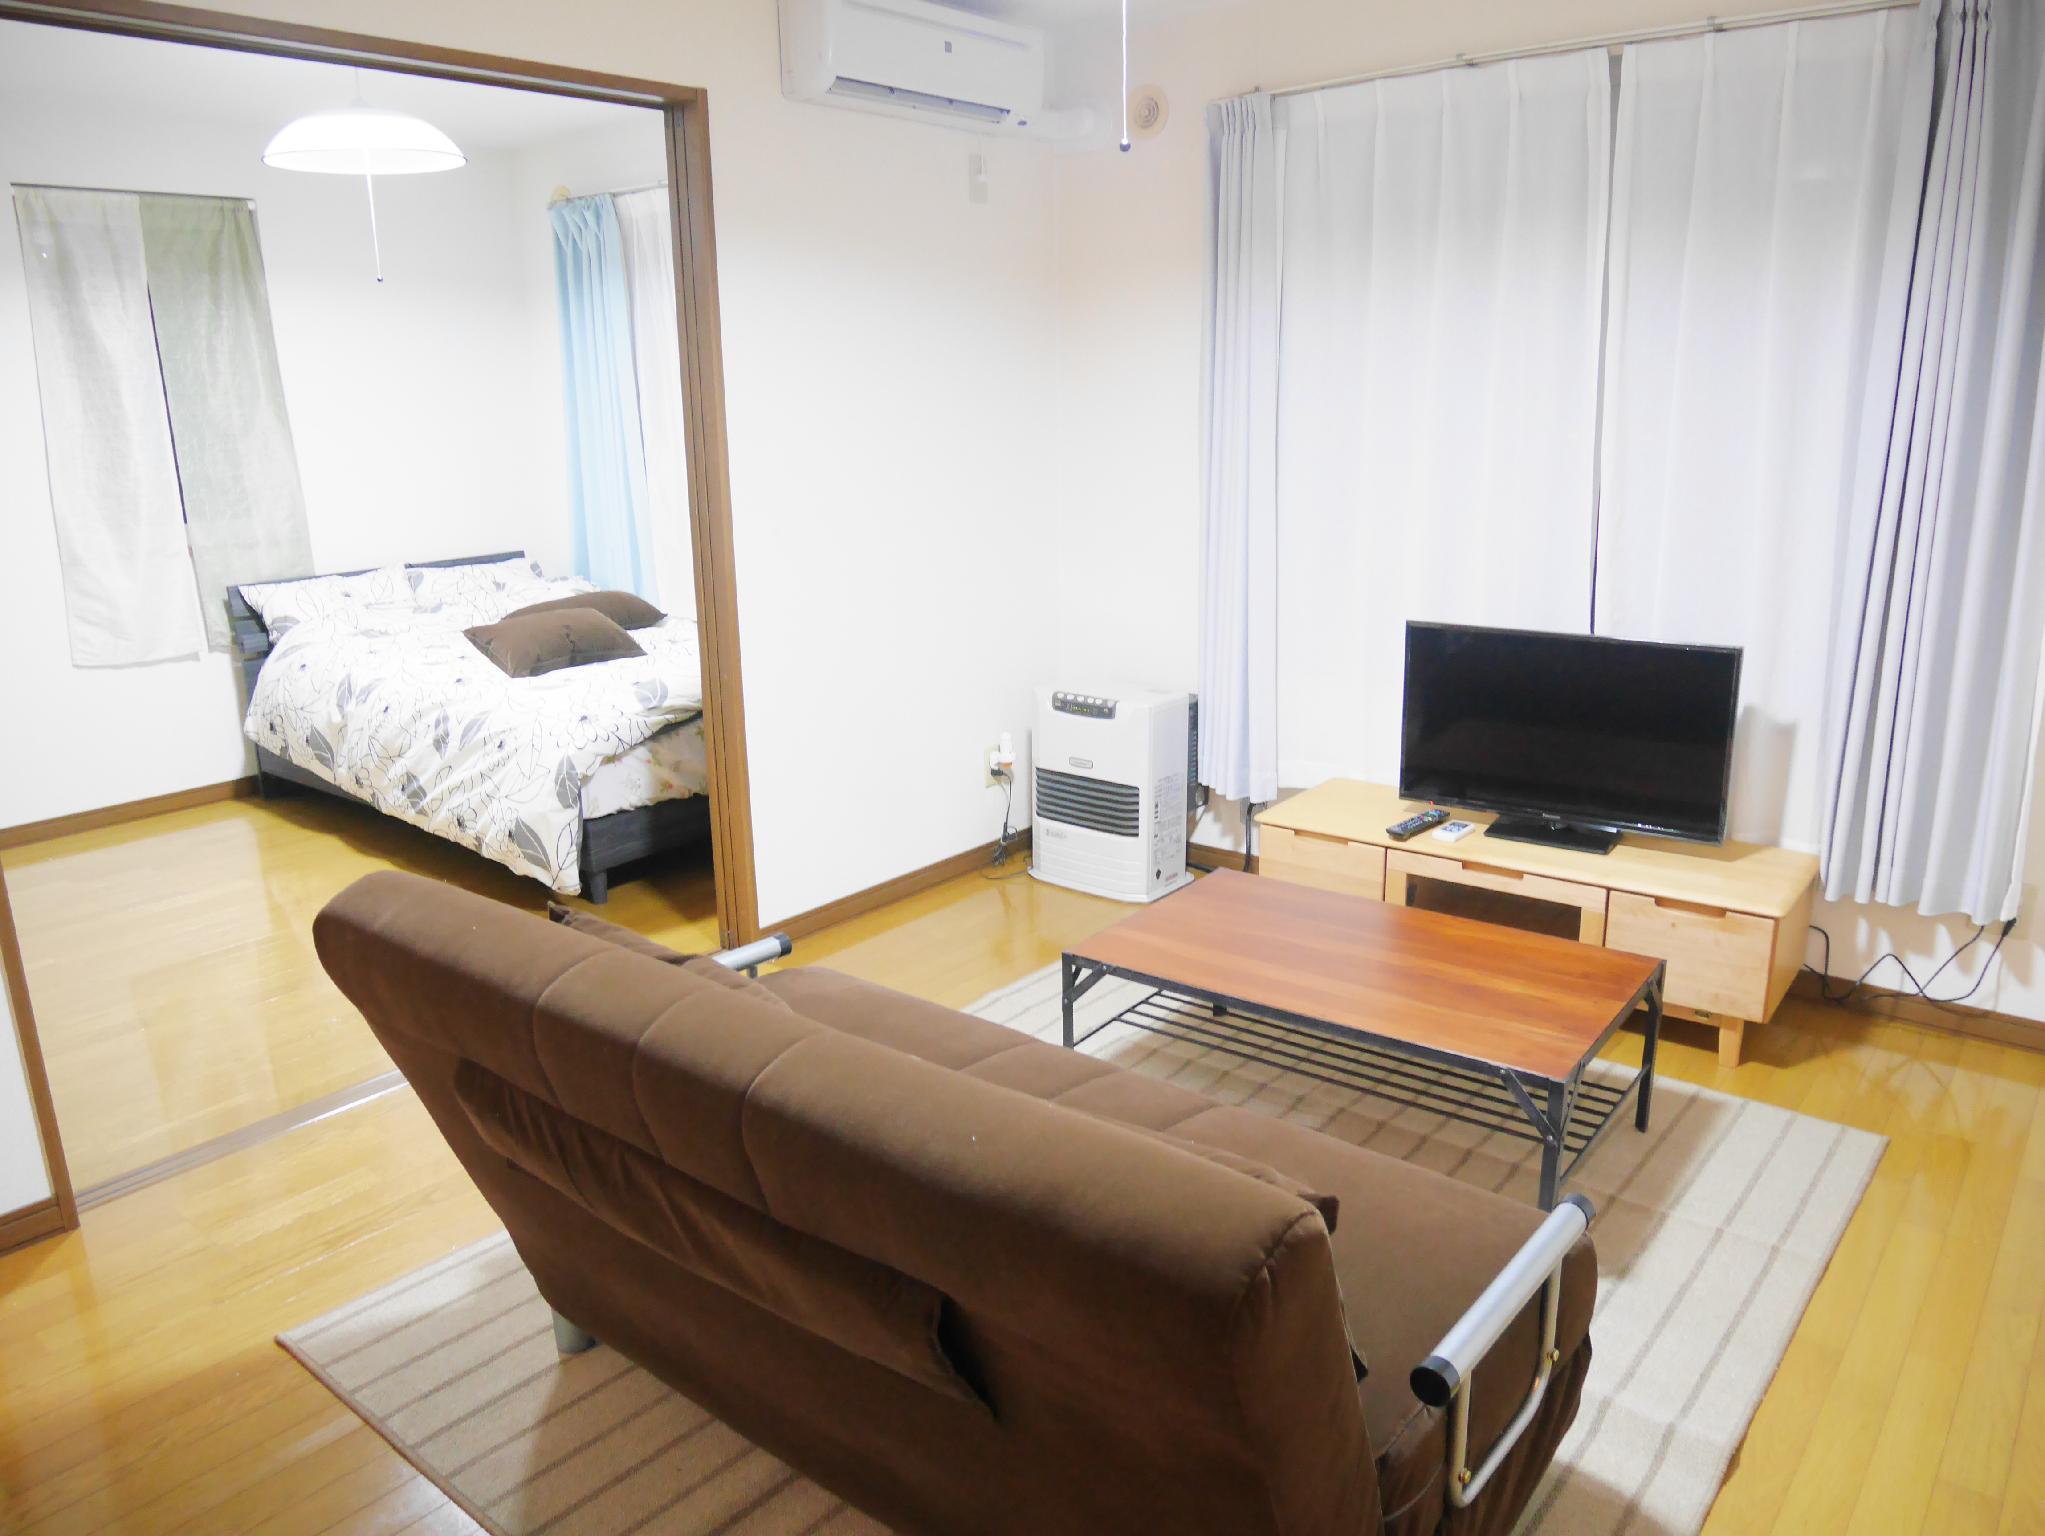 KB 1 Bedroom Apartment In Sapopro E101